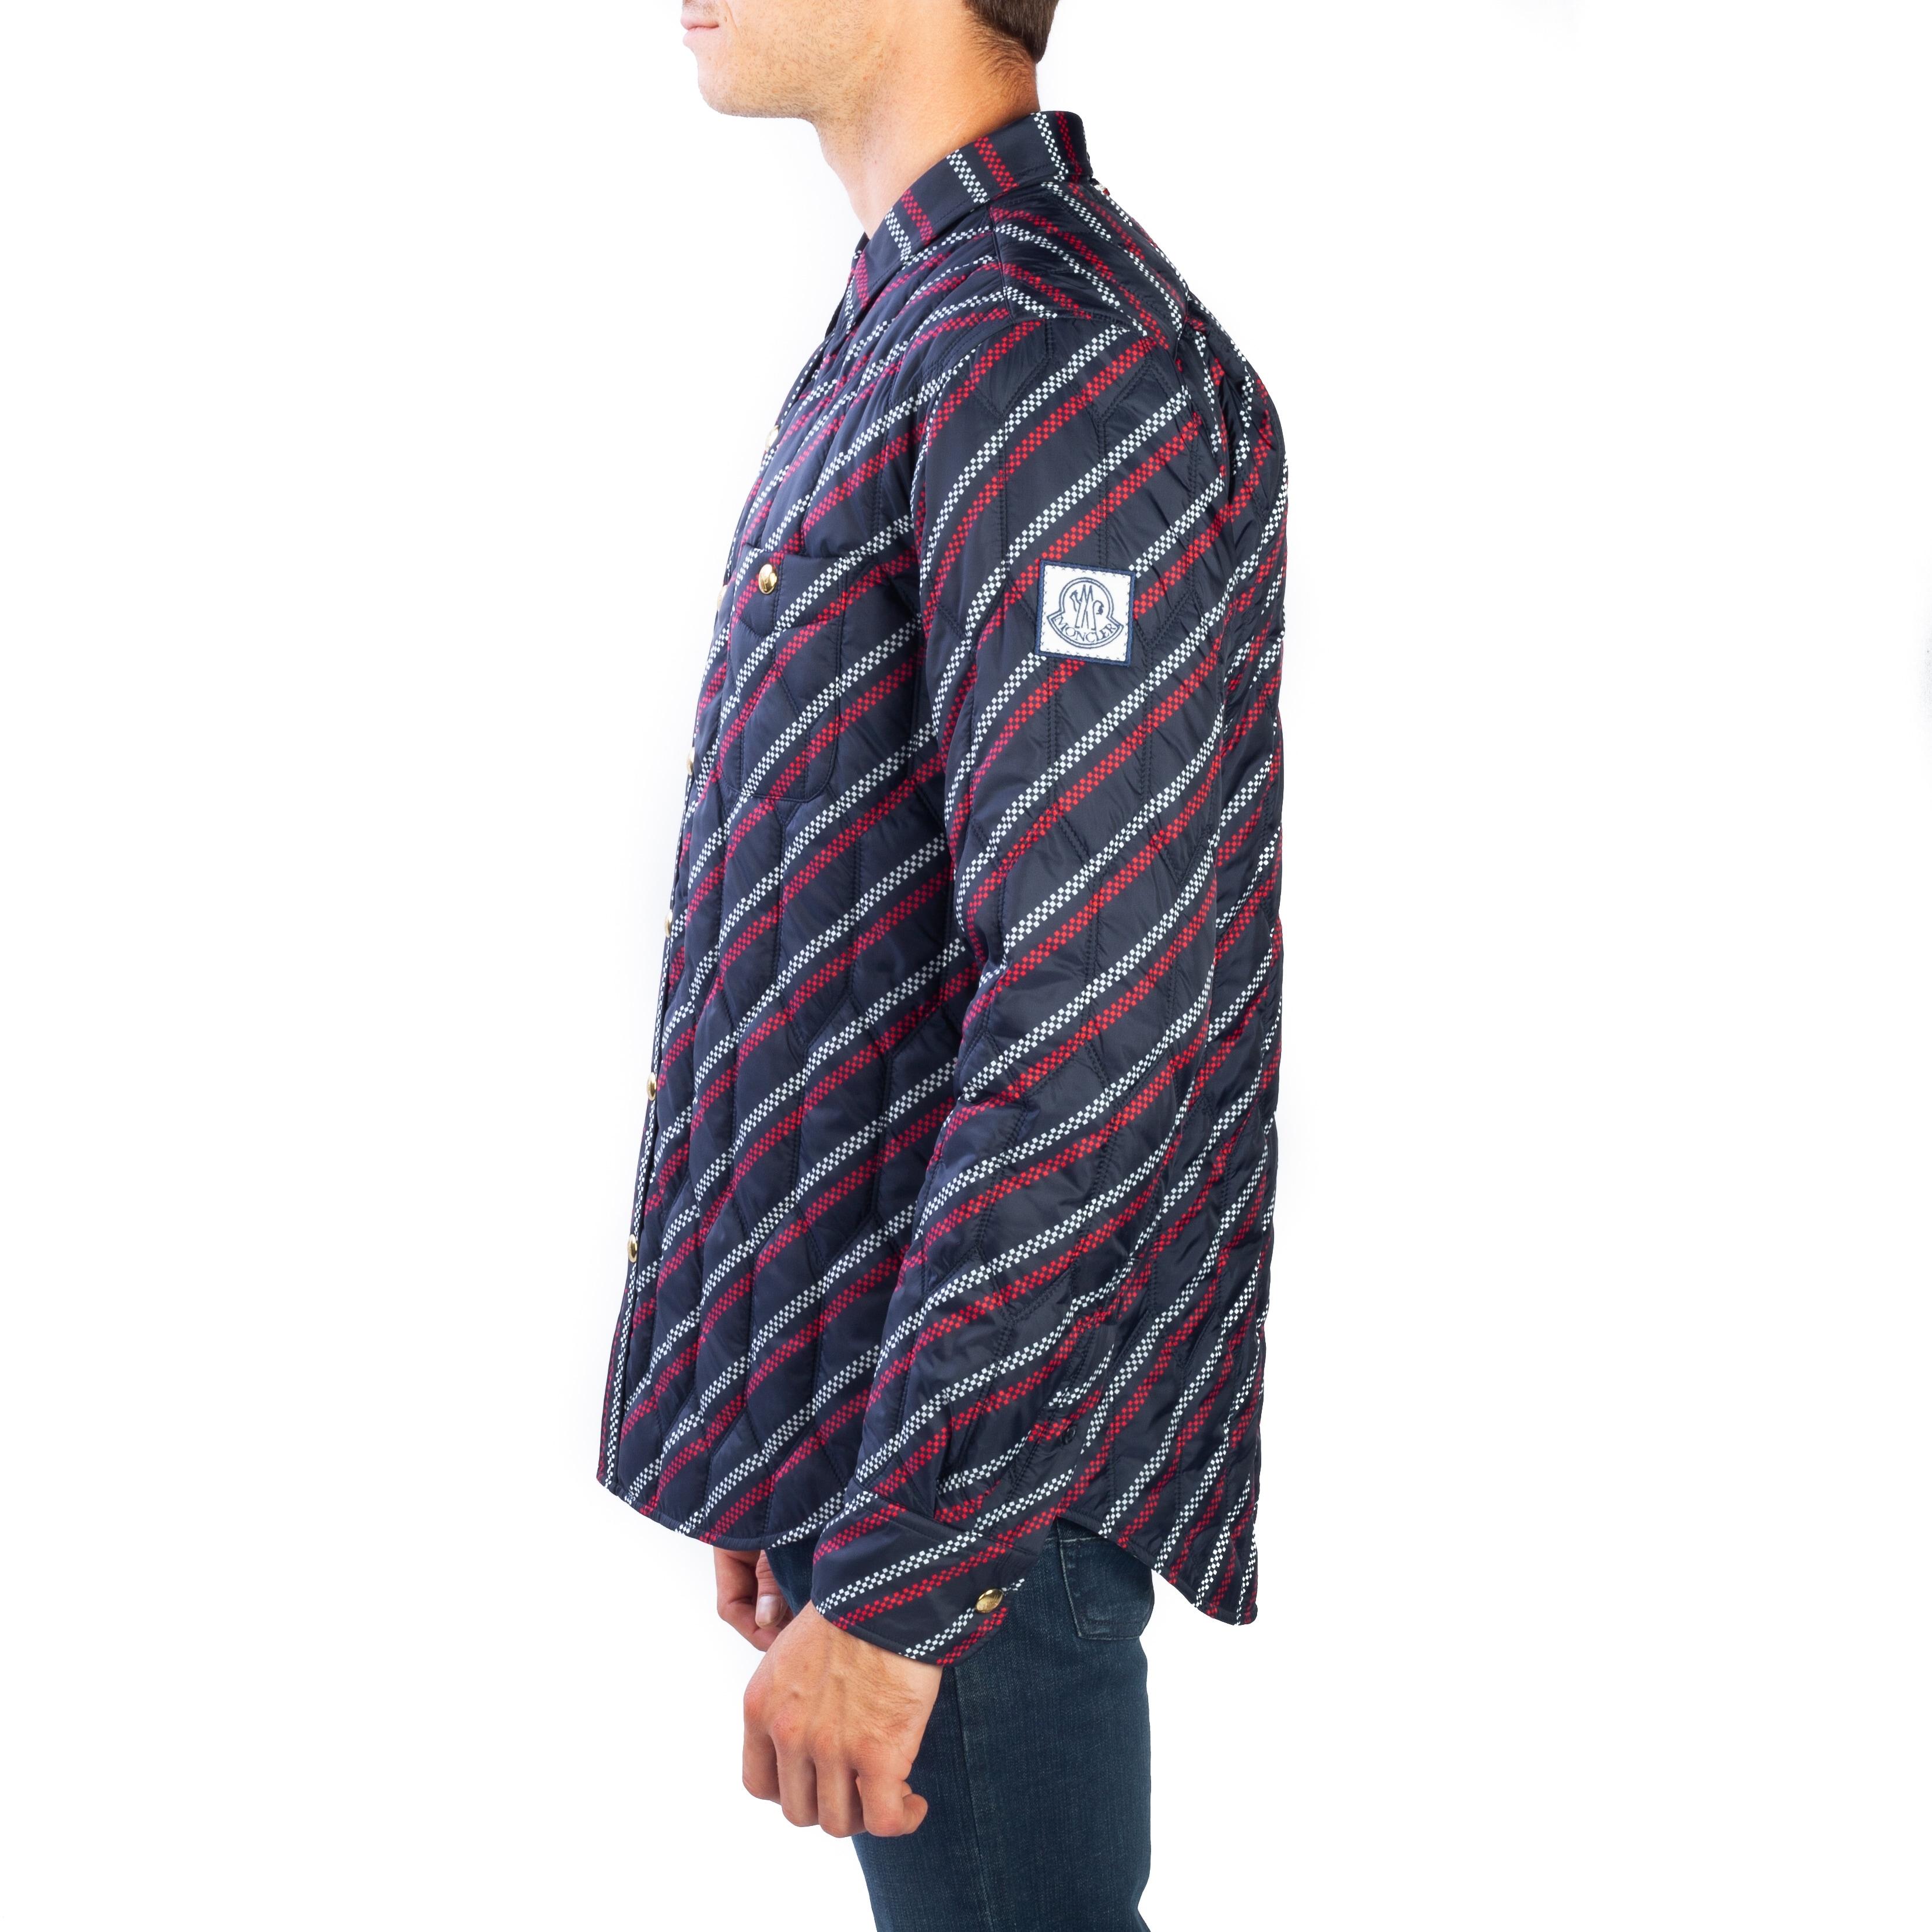 792127a60fd3 Shop Moncler Men s Polyester Checkered Stripe Down Jacket Navy Blue ...